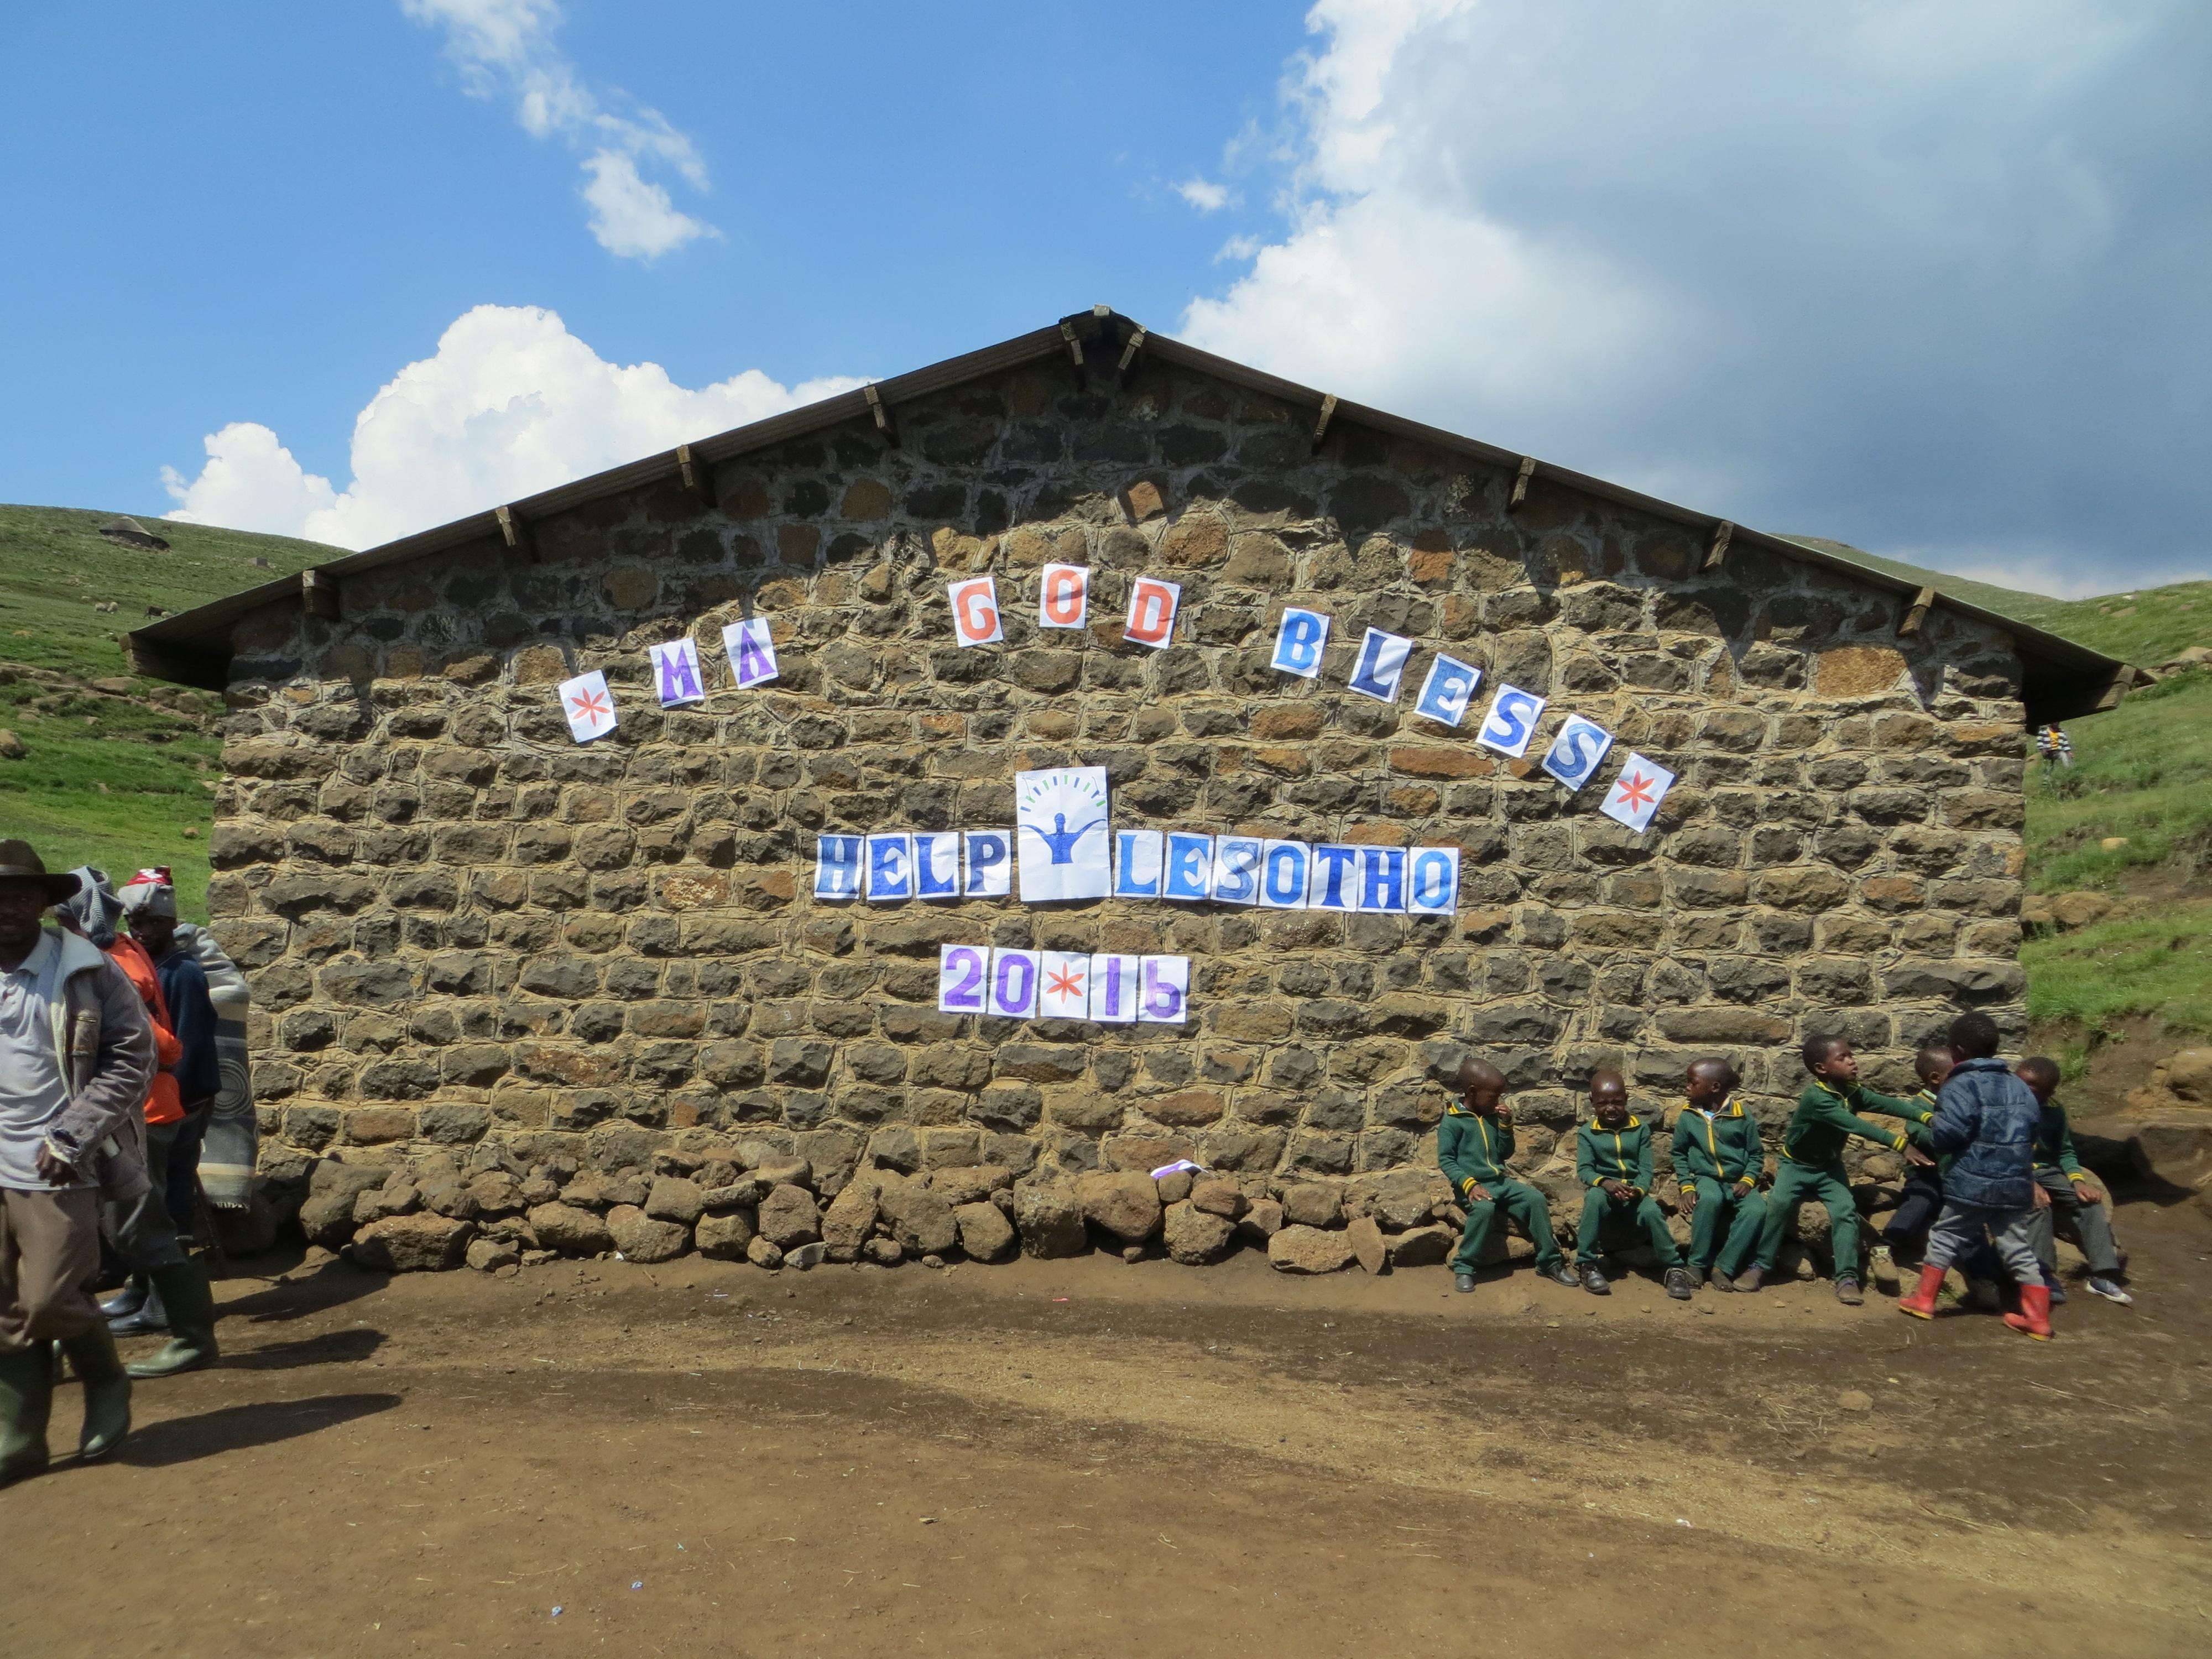 God Bless Help Lesotho 2016